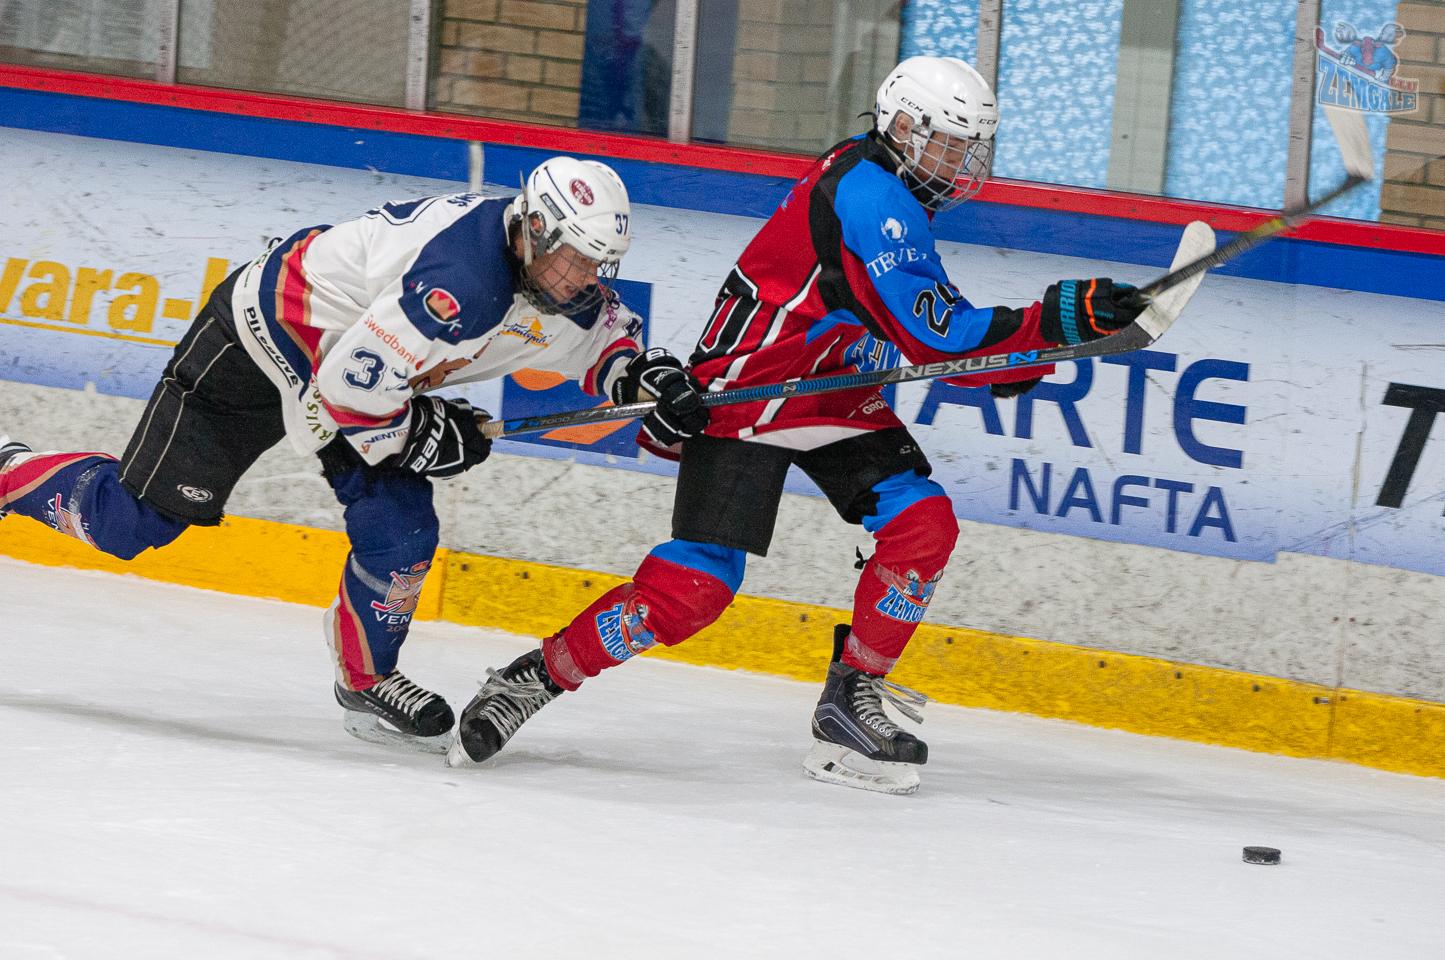 Jelgavas hokeja skola JLSS U17 - Venta 2002 14092019-04